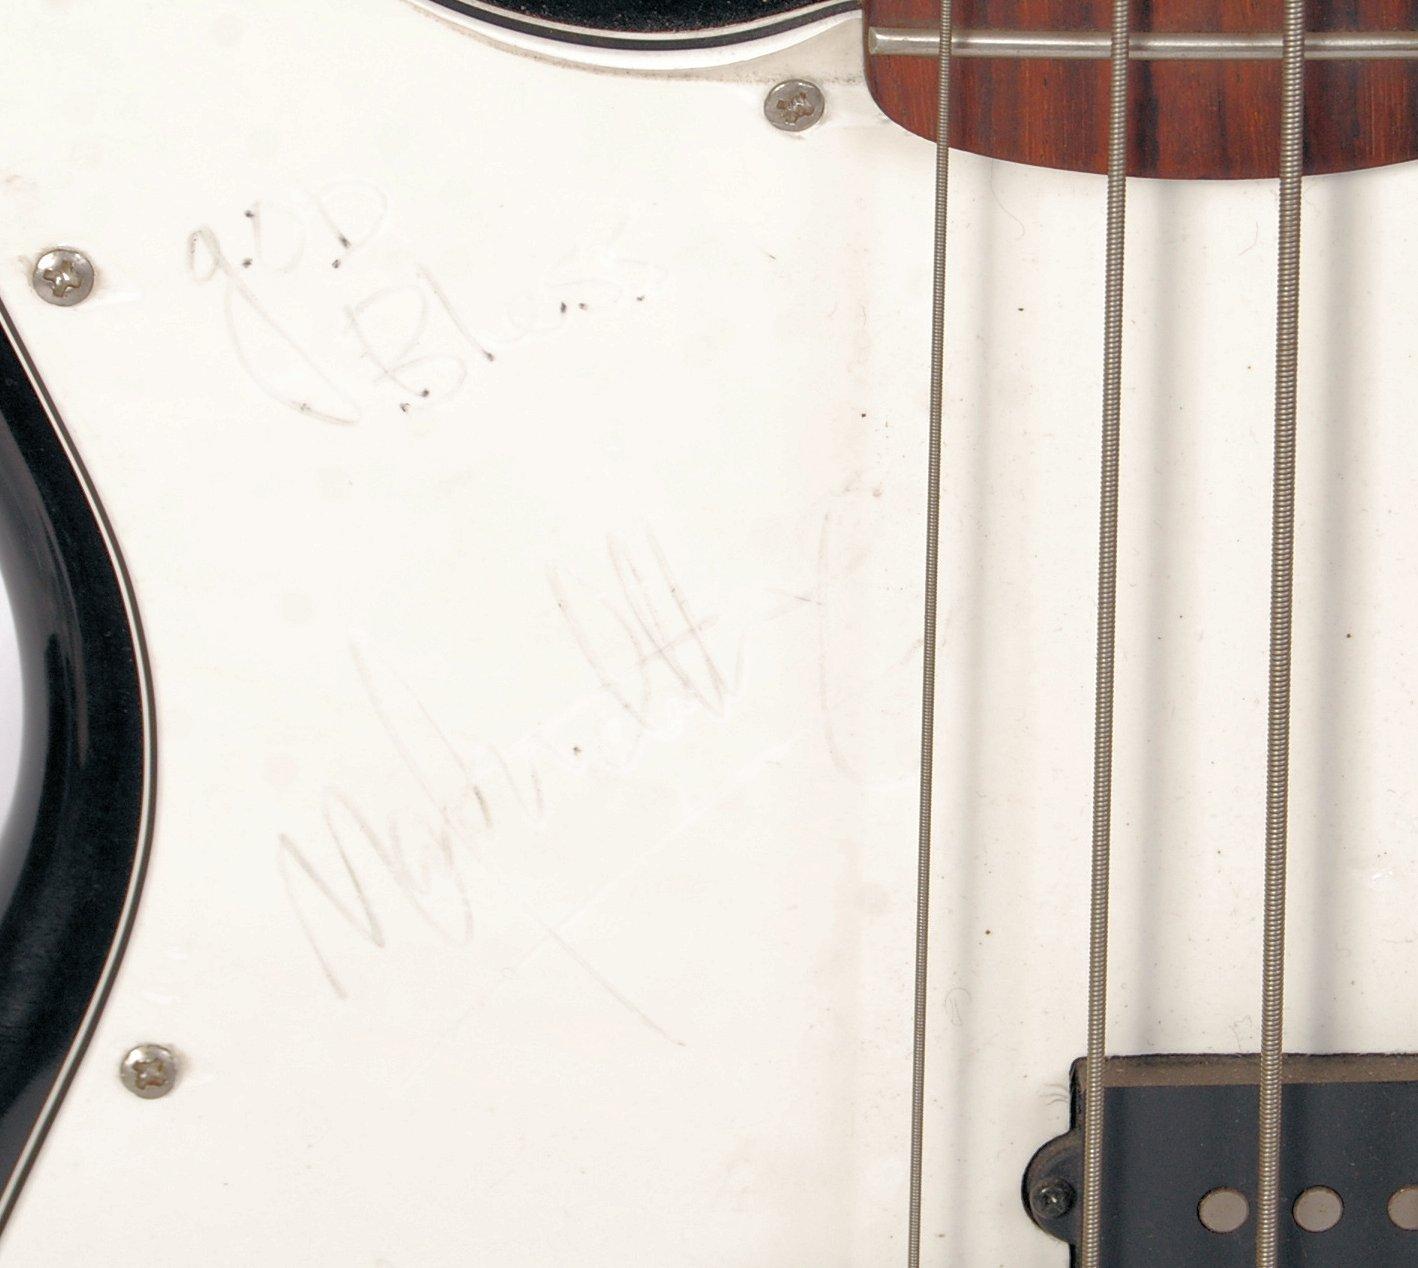 MARK WAHLBERG ' ROCKSTAR ' PROP LEFT HANDED BASS G - Image 2 of 8